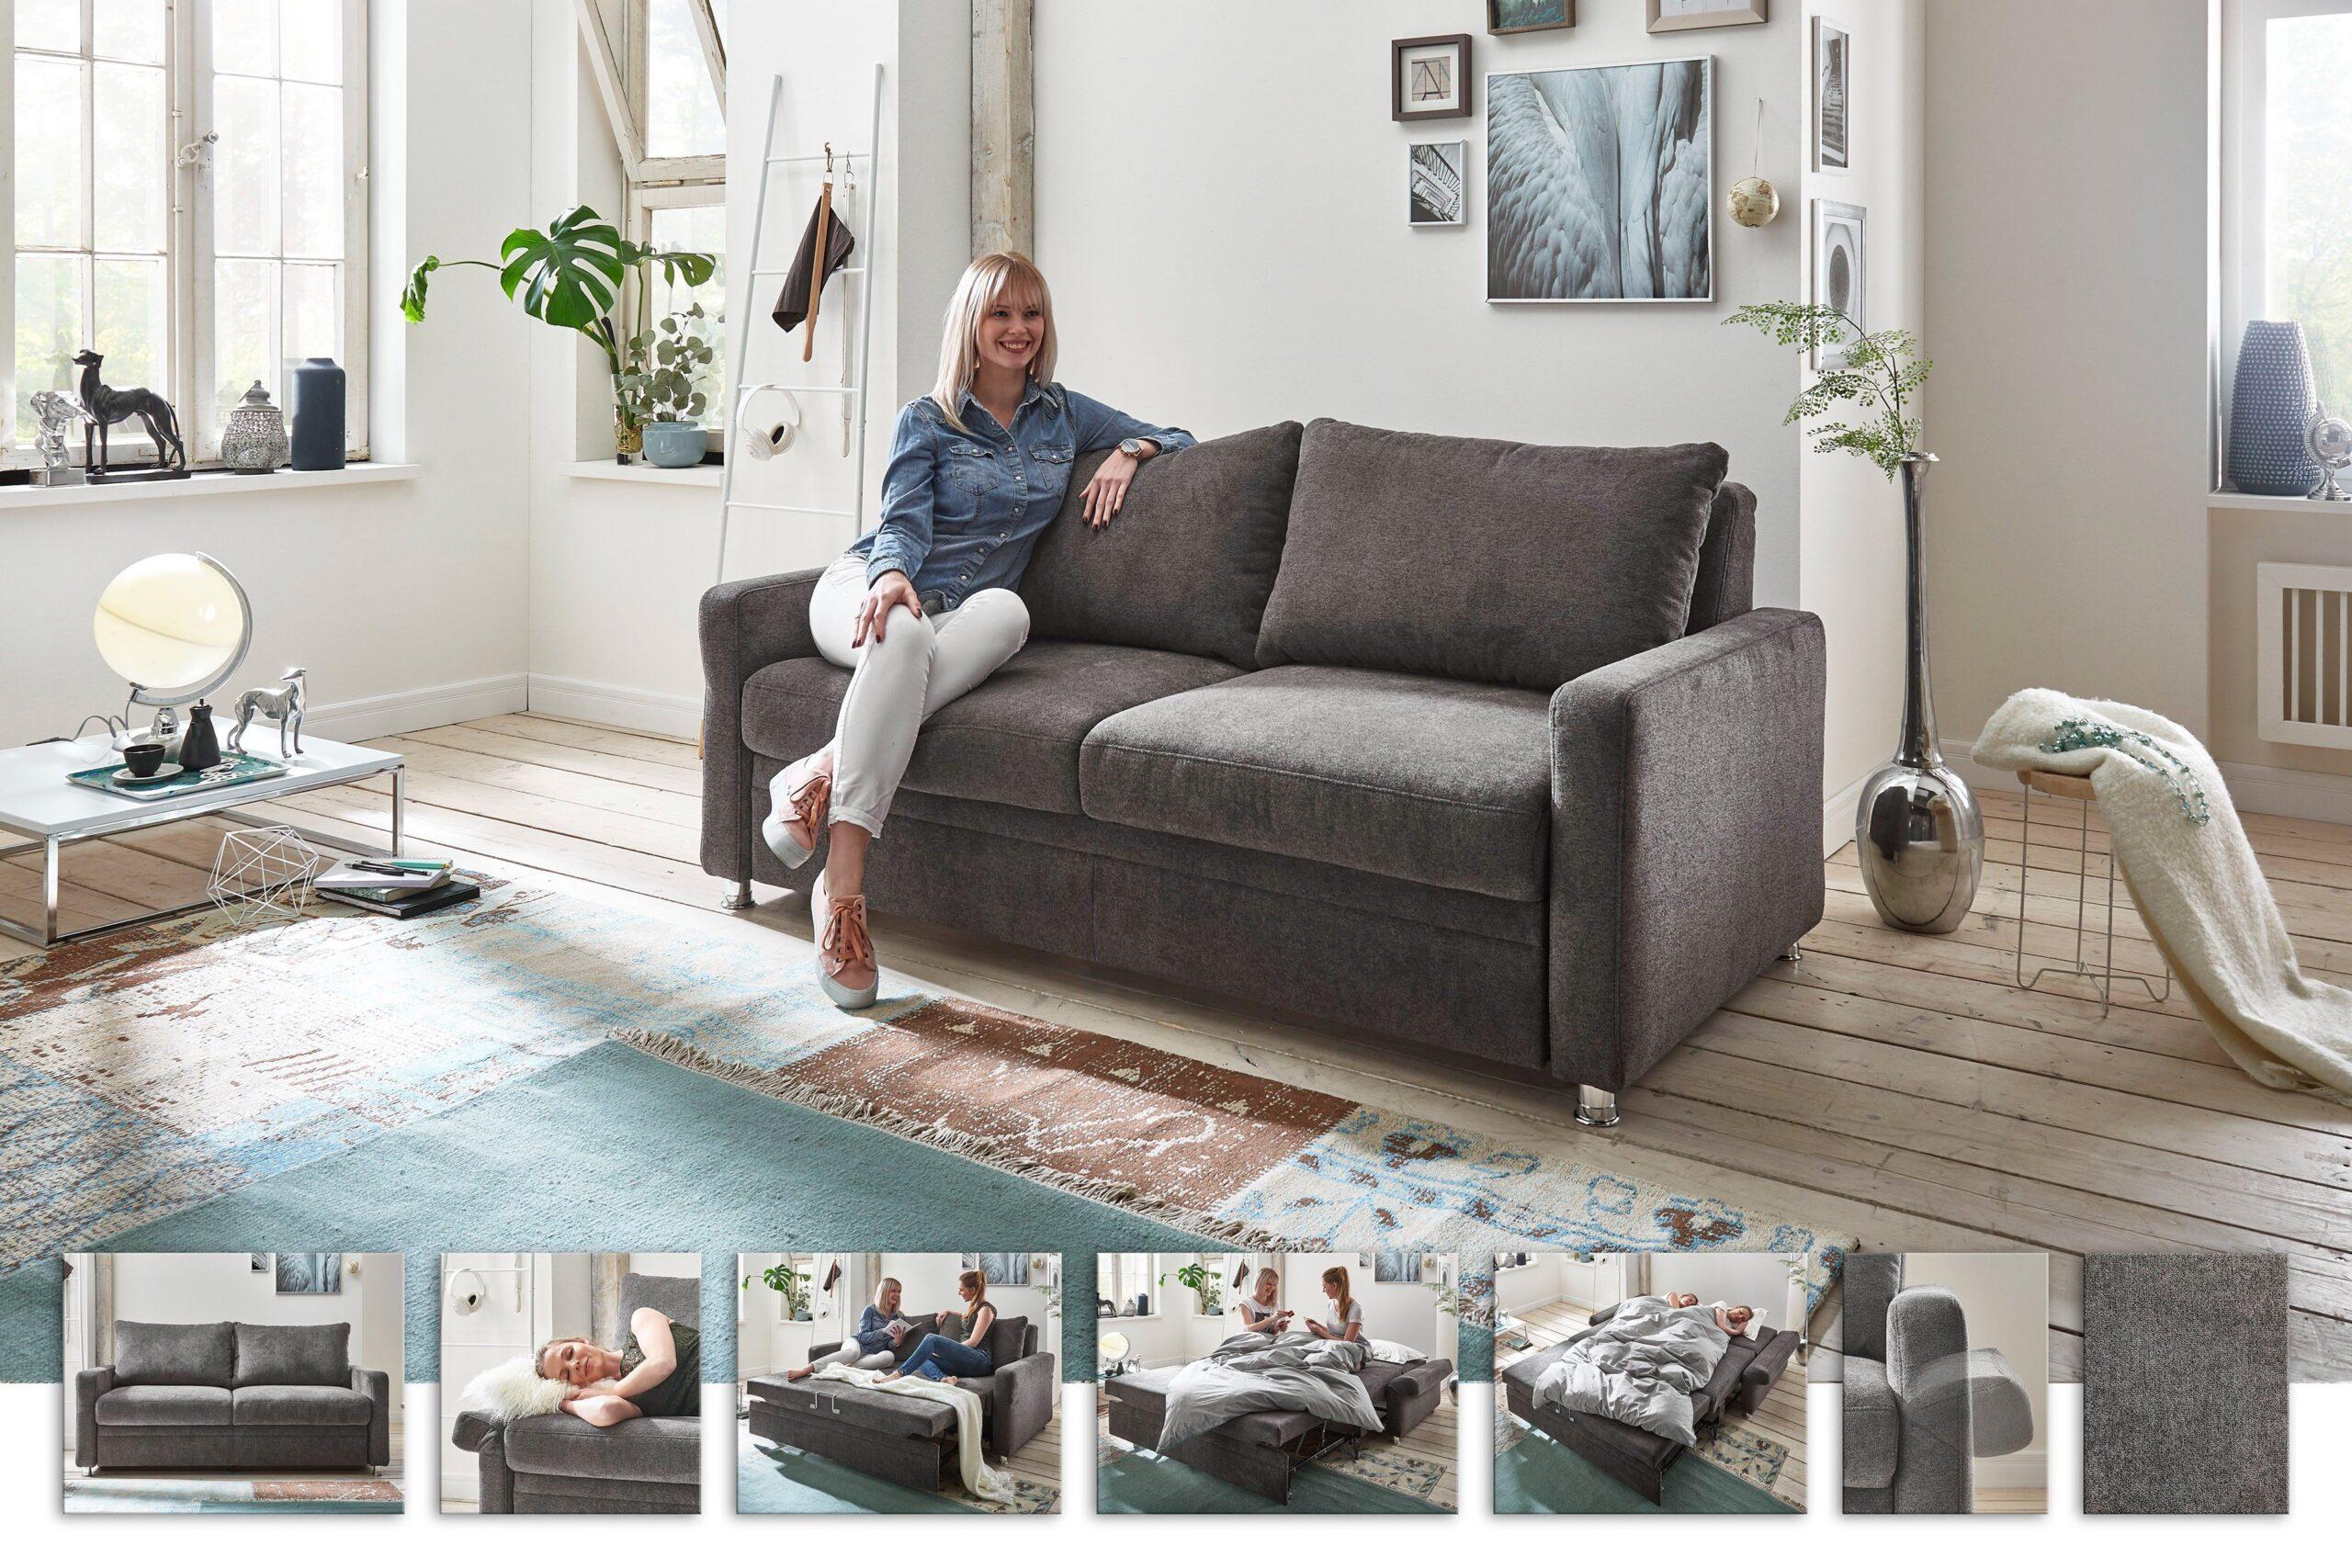 Full Size of Indomo Sofa Megapol Polstermbel Platzda Couch Schwarz Mbel Letz Ihr Impressionen Rattan Garten Big Leder 3 Teilig Mit Schlaffunktion Barock Wildleder Sofa Indomo Sofa